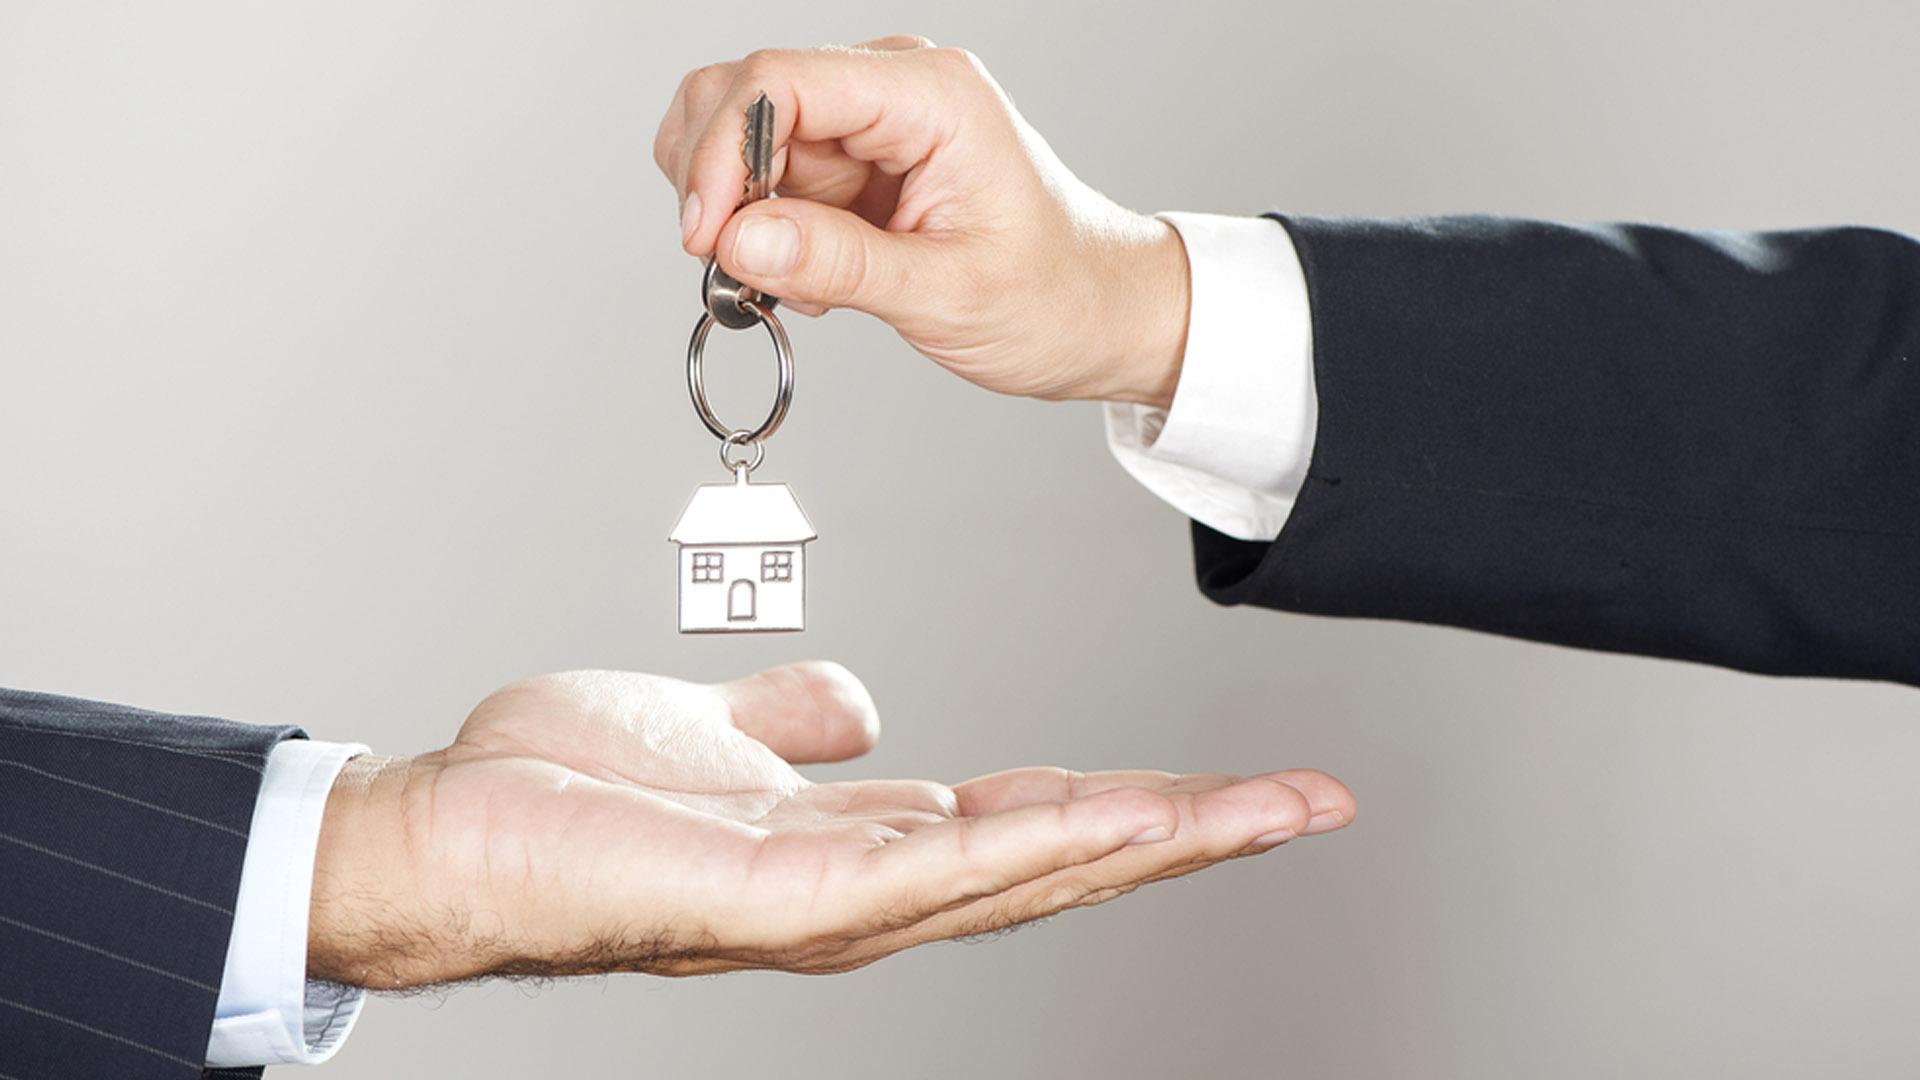 Pune property registrations up 34% in December, Maharashtra sees 29% rise